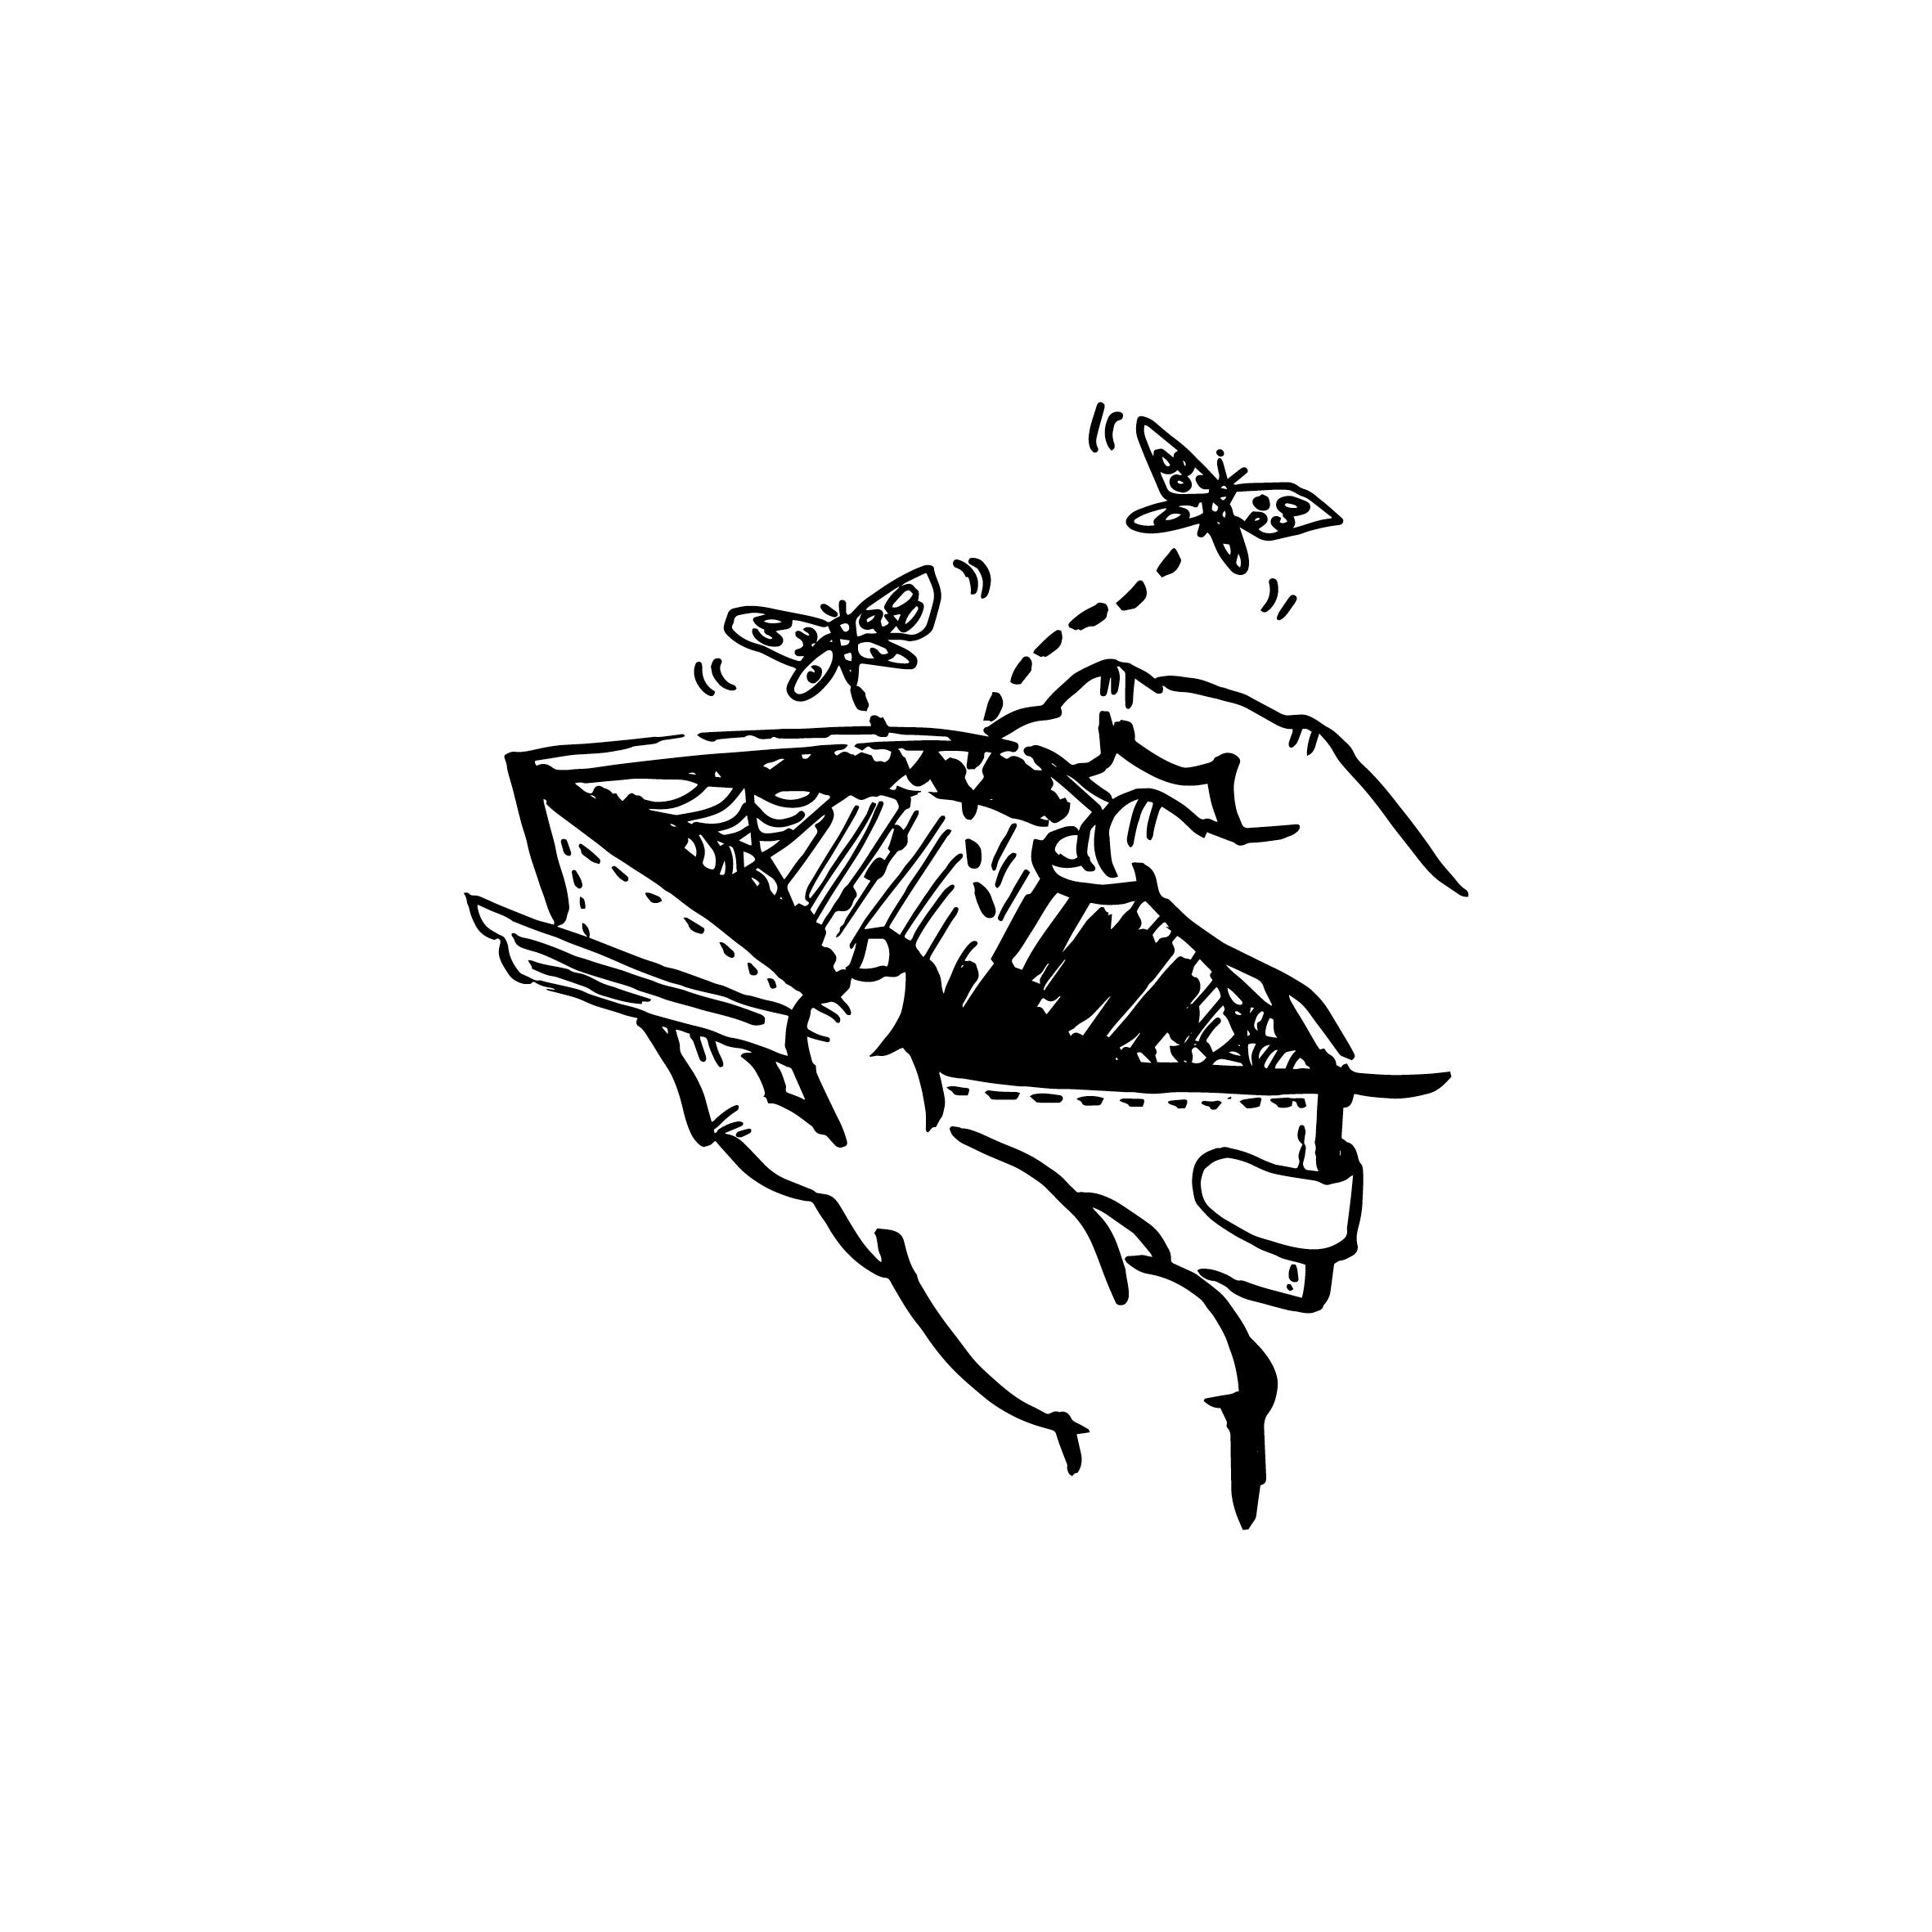 TheMumRants_Illustrations_v41111.jpg